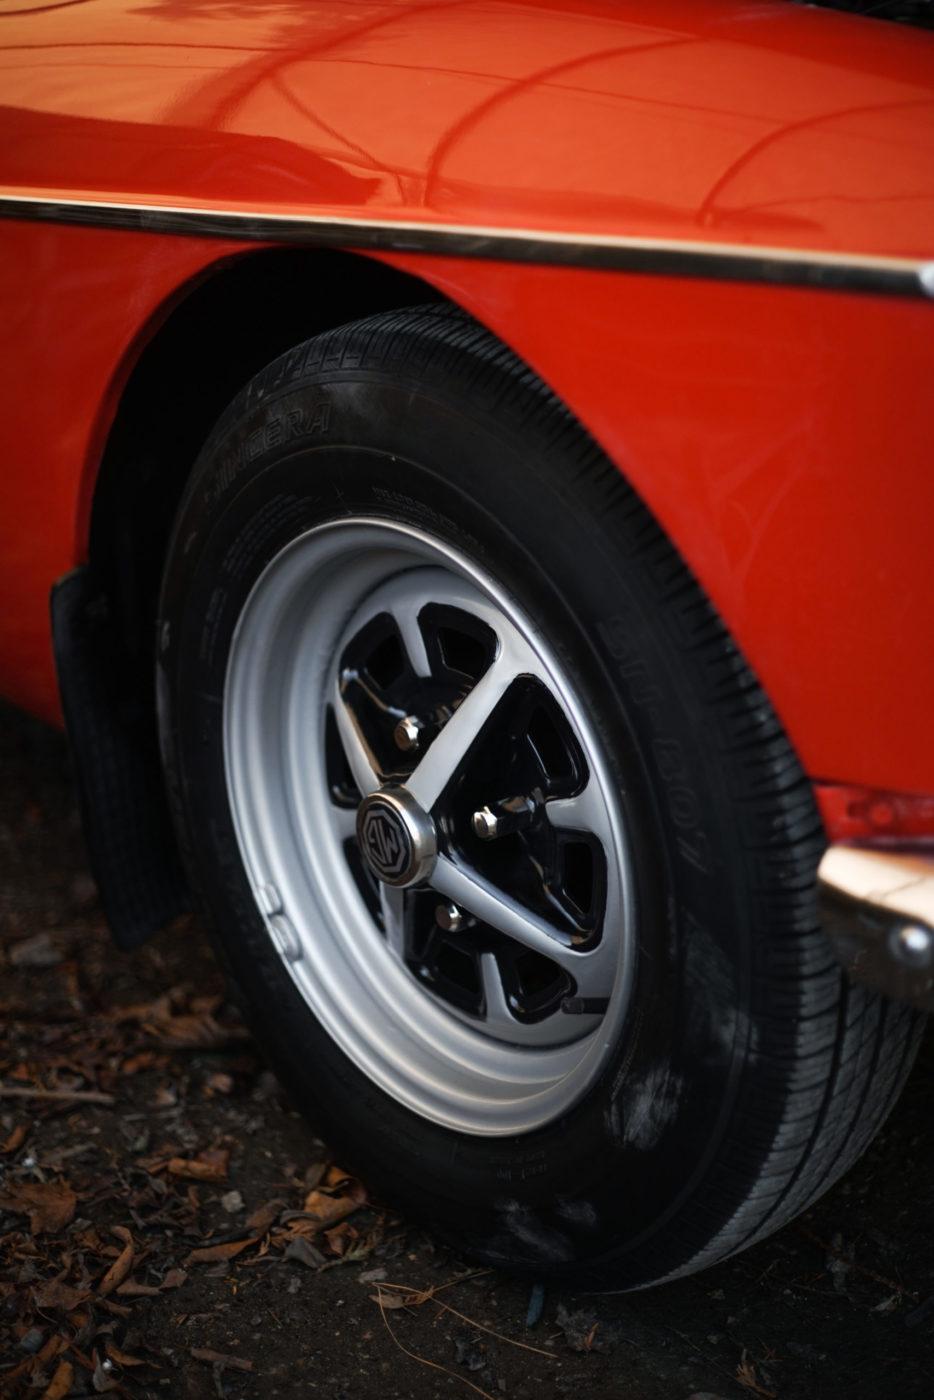 1966 Austin A40 Farina - Bridge Classic Cars : Bridge